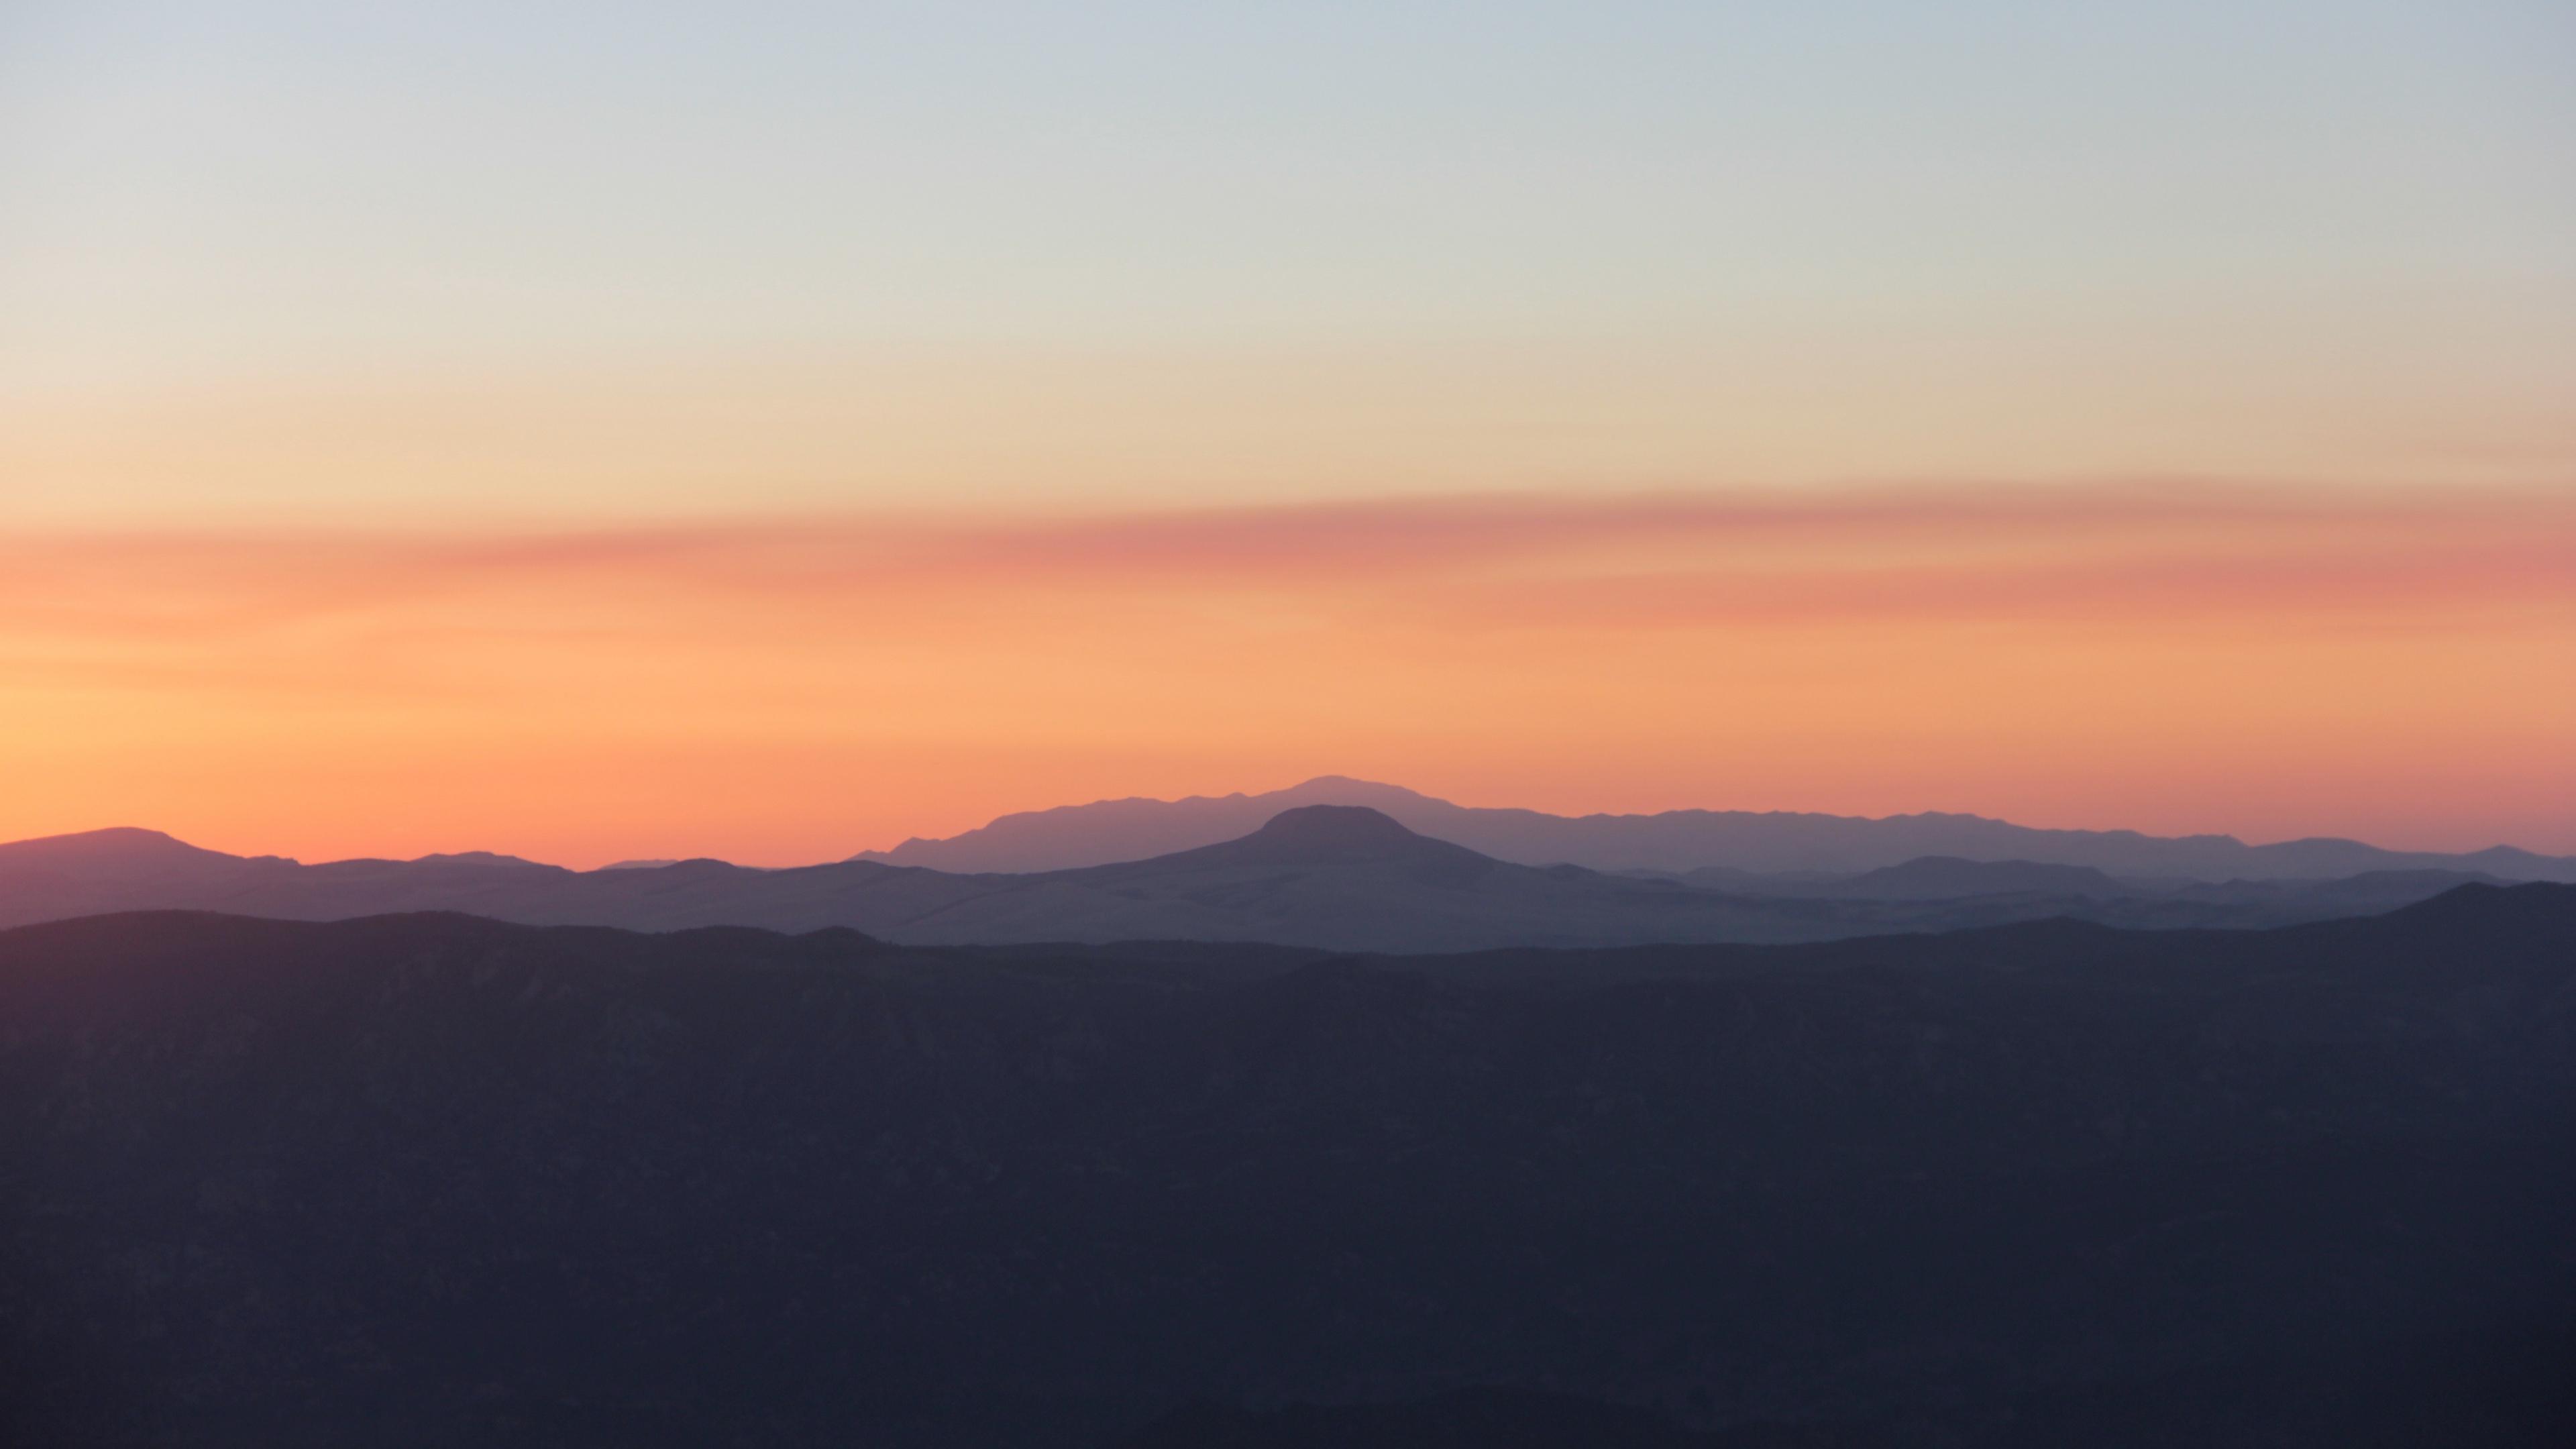 mountains skyline sunrise 4k 1541114060 - mountains, skyline, sunrise 4k - sunrise, Skyline, Mountains